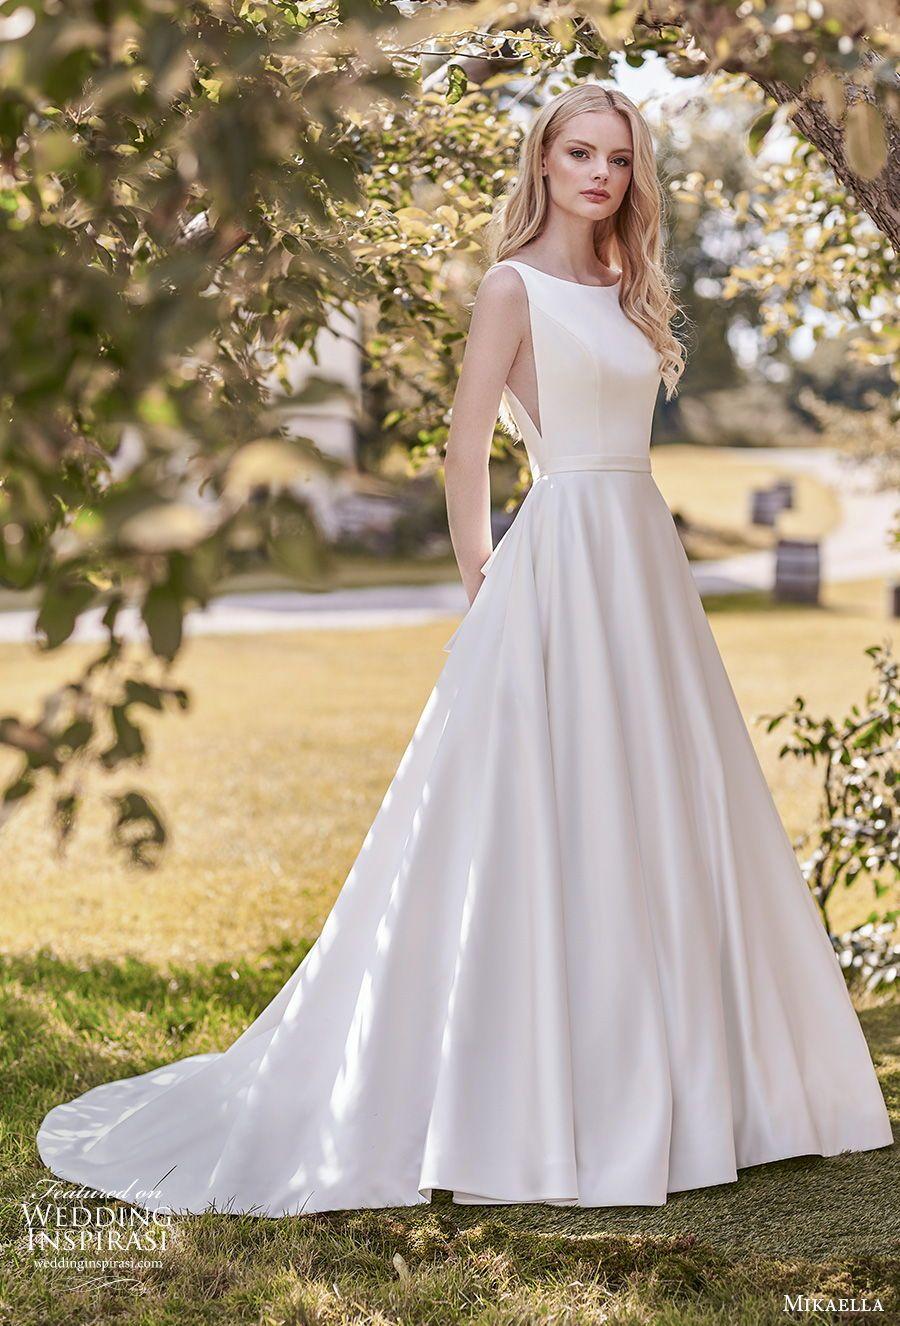 Mikaella Bridal Spring 2020 Wedding Dresses Wedding Inspirasi Mikaella Bridal Wedding Dress Styles Wedding Dress With Pockets [ 1326 x 900 Pixel ]